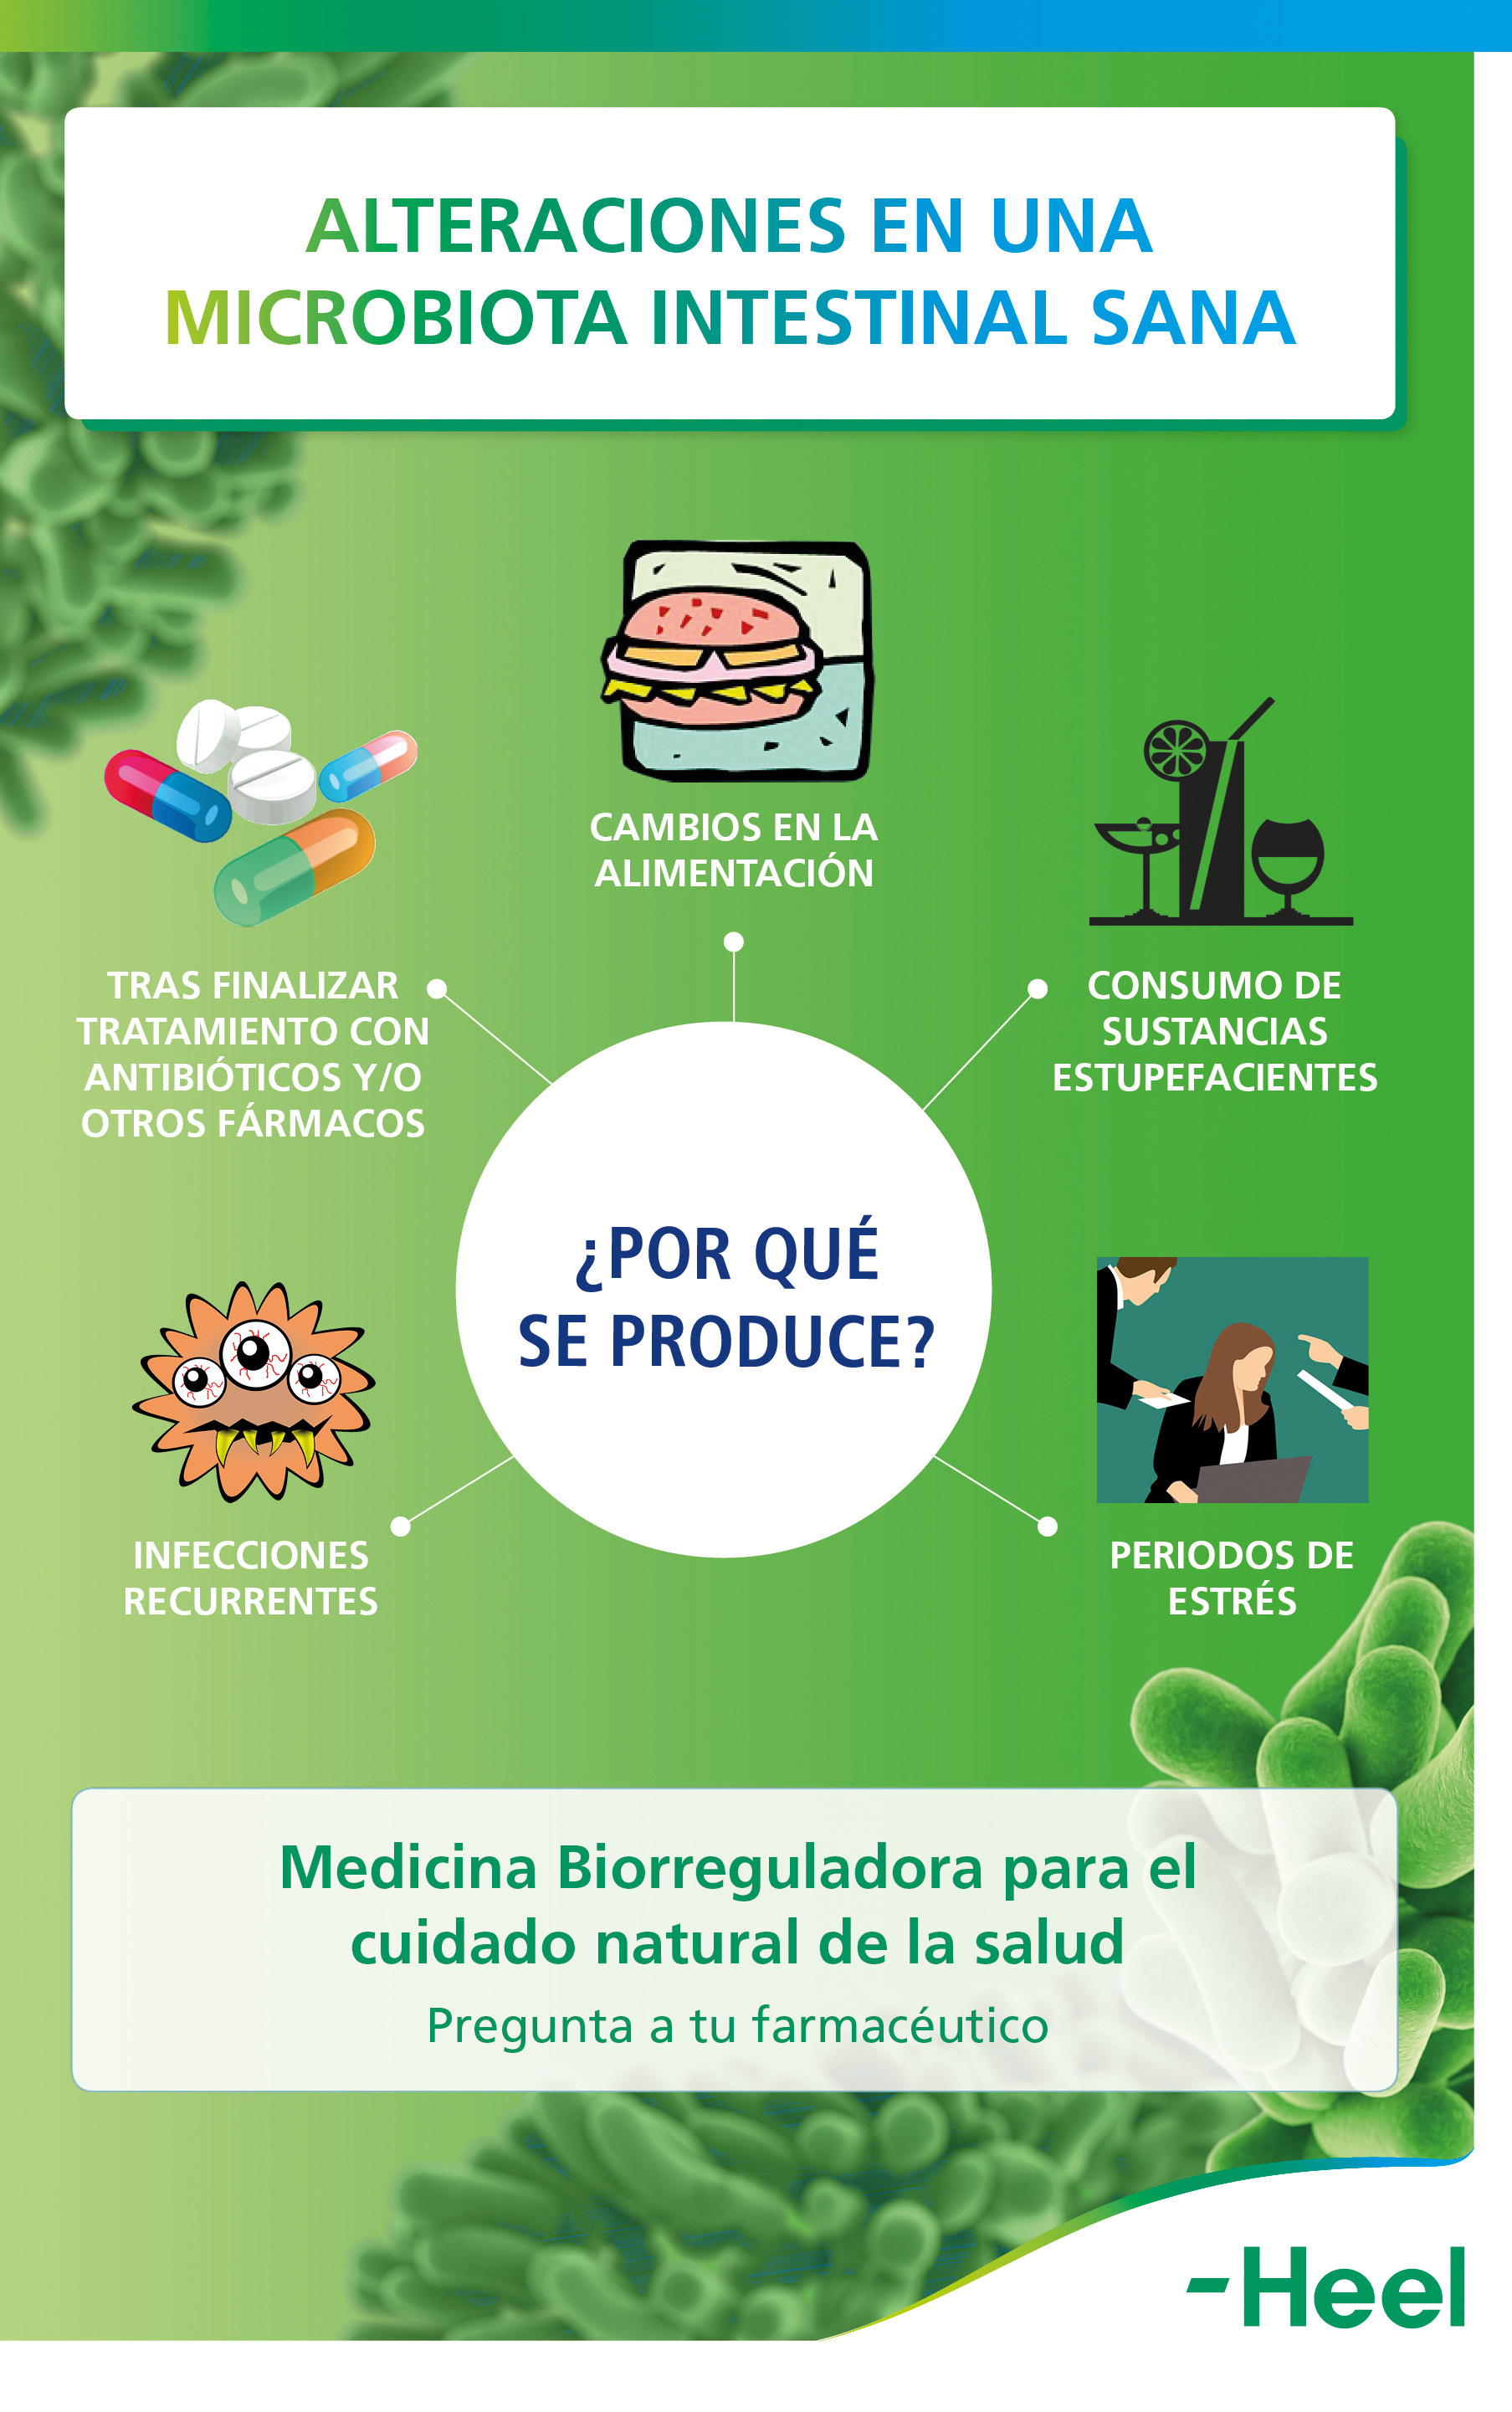 Importancia de la microbiota intestinal sana - HeelProbiotics - Heel España